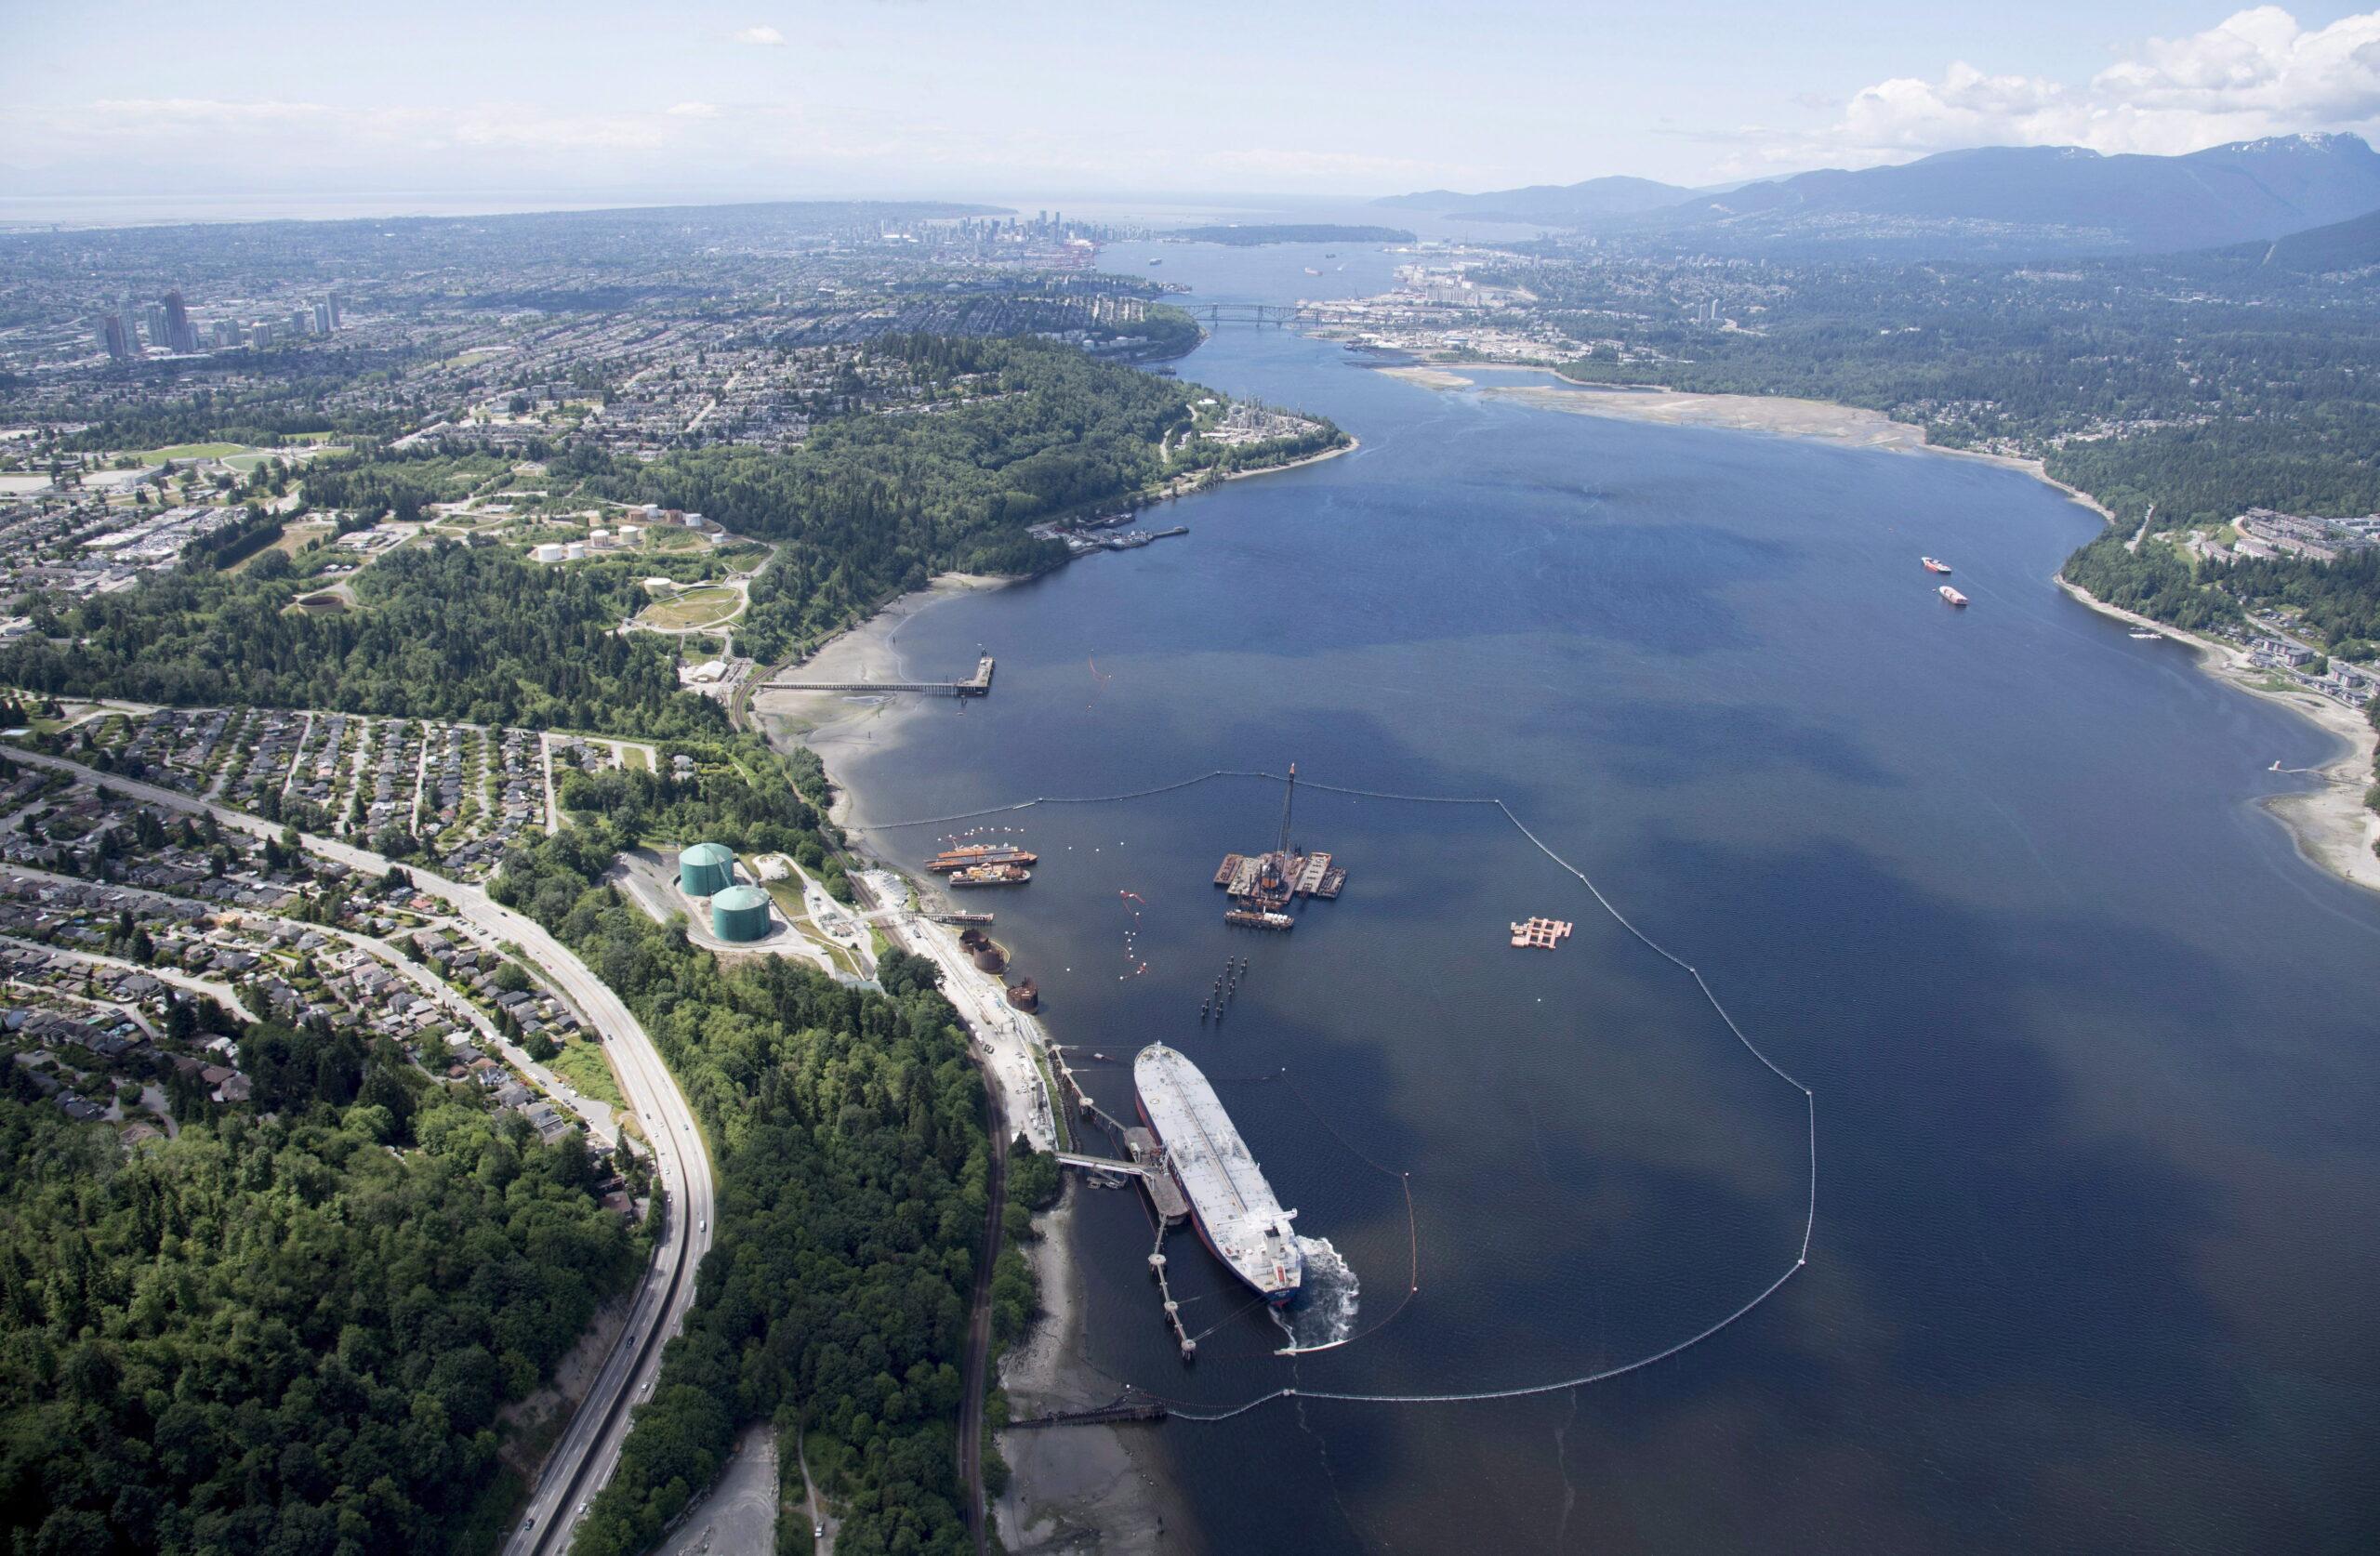 A aerial view of Kinder Morgan's Trans Mountain marine terminal